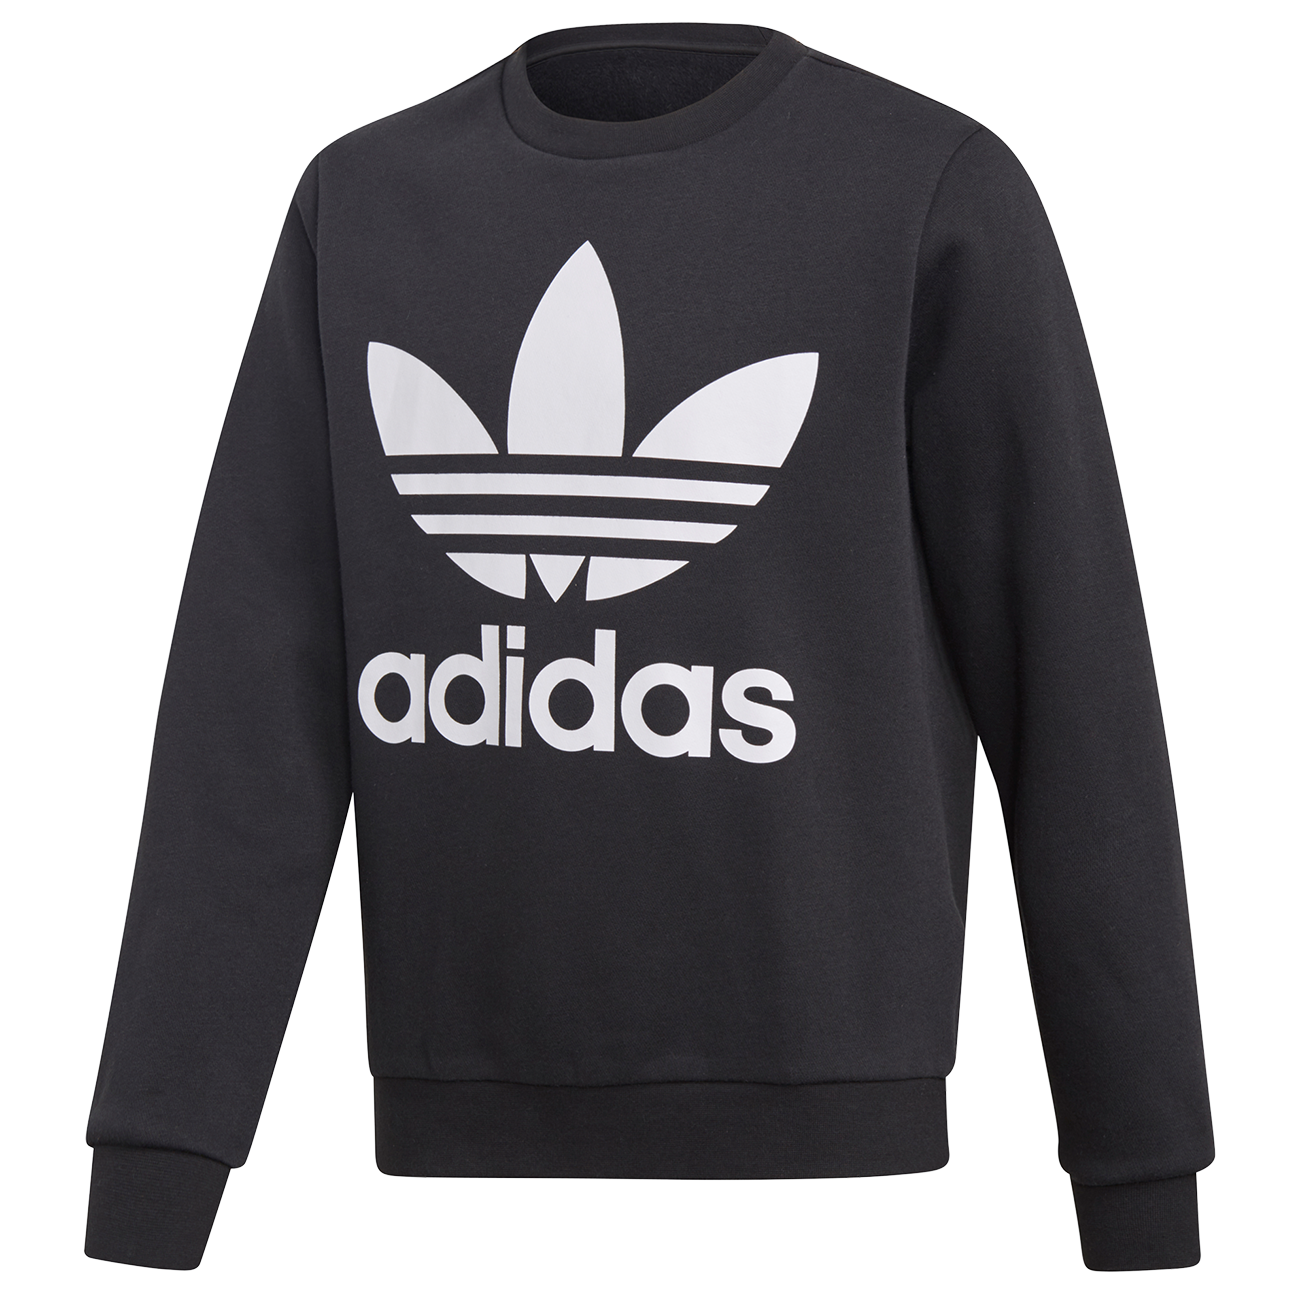 adidas Crew Sweatshirt Black/White